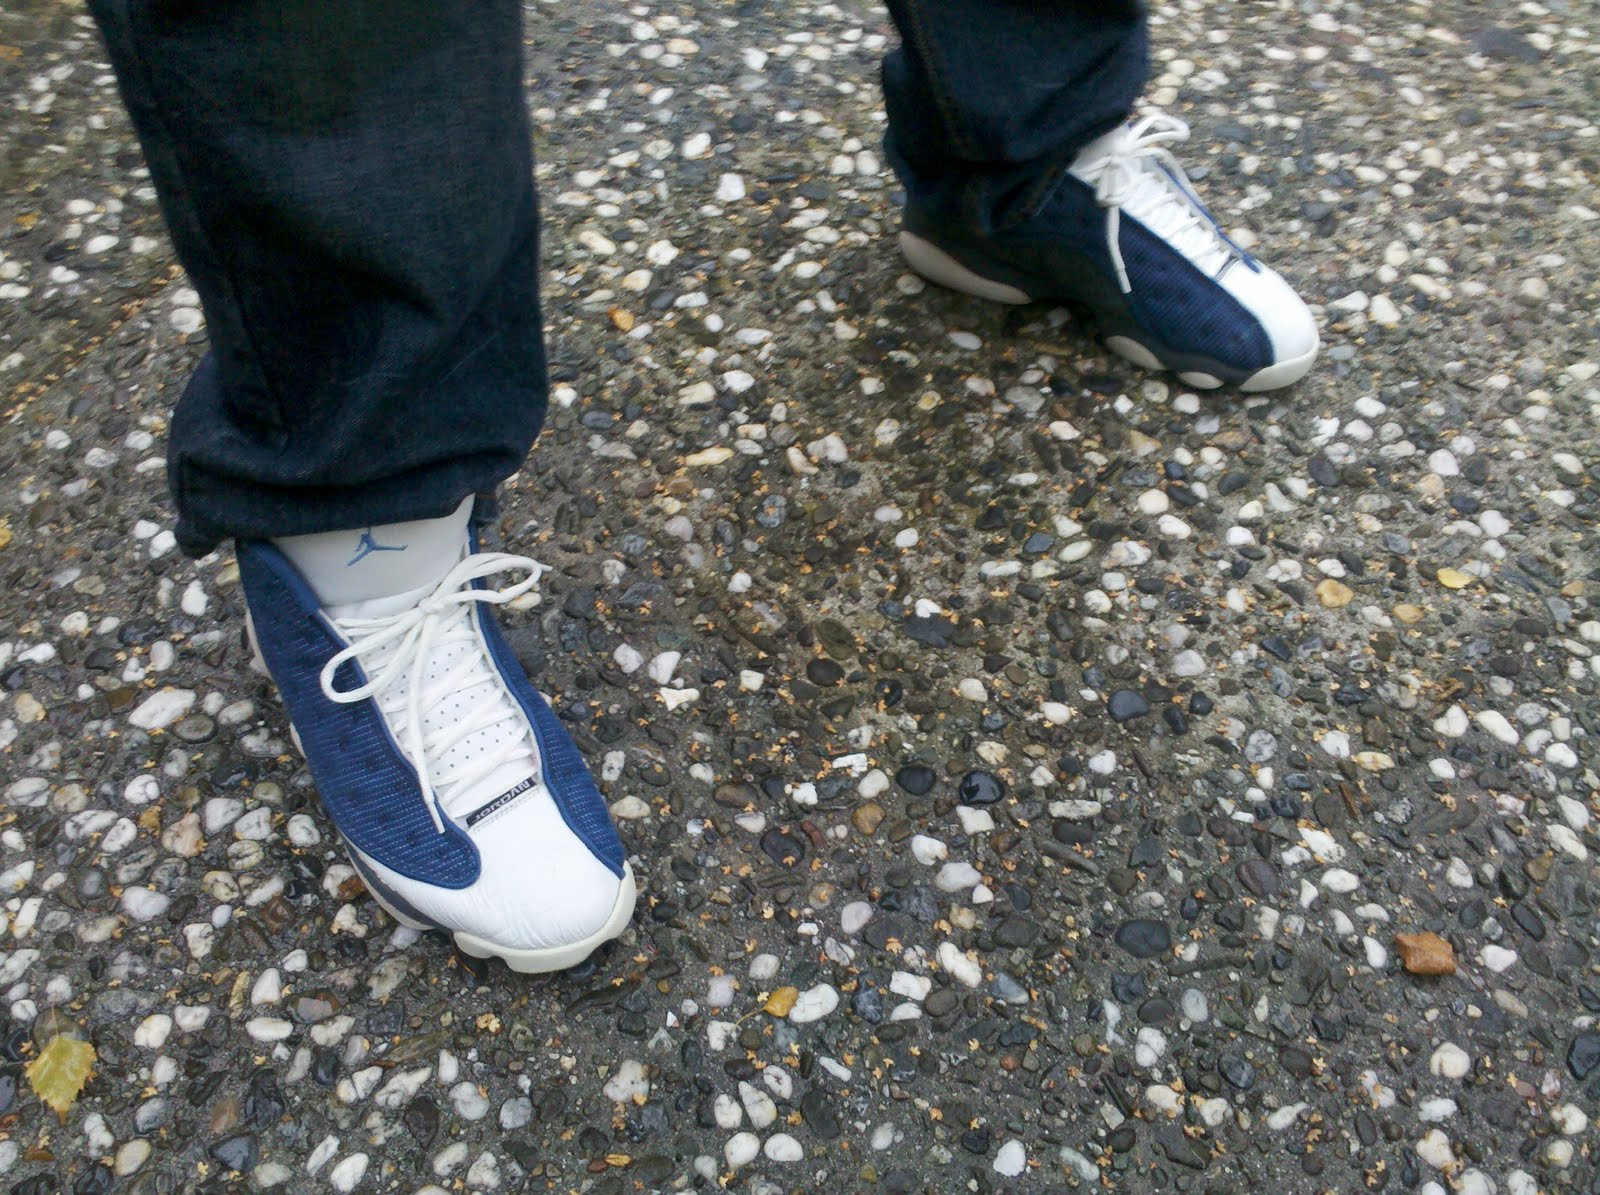 dc28e831f49 KickItFresh Sneaker Photo Blog  SNEAKER REVIEW - AIR JORDAN XIII